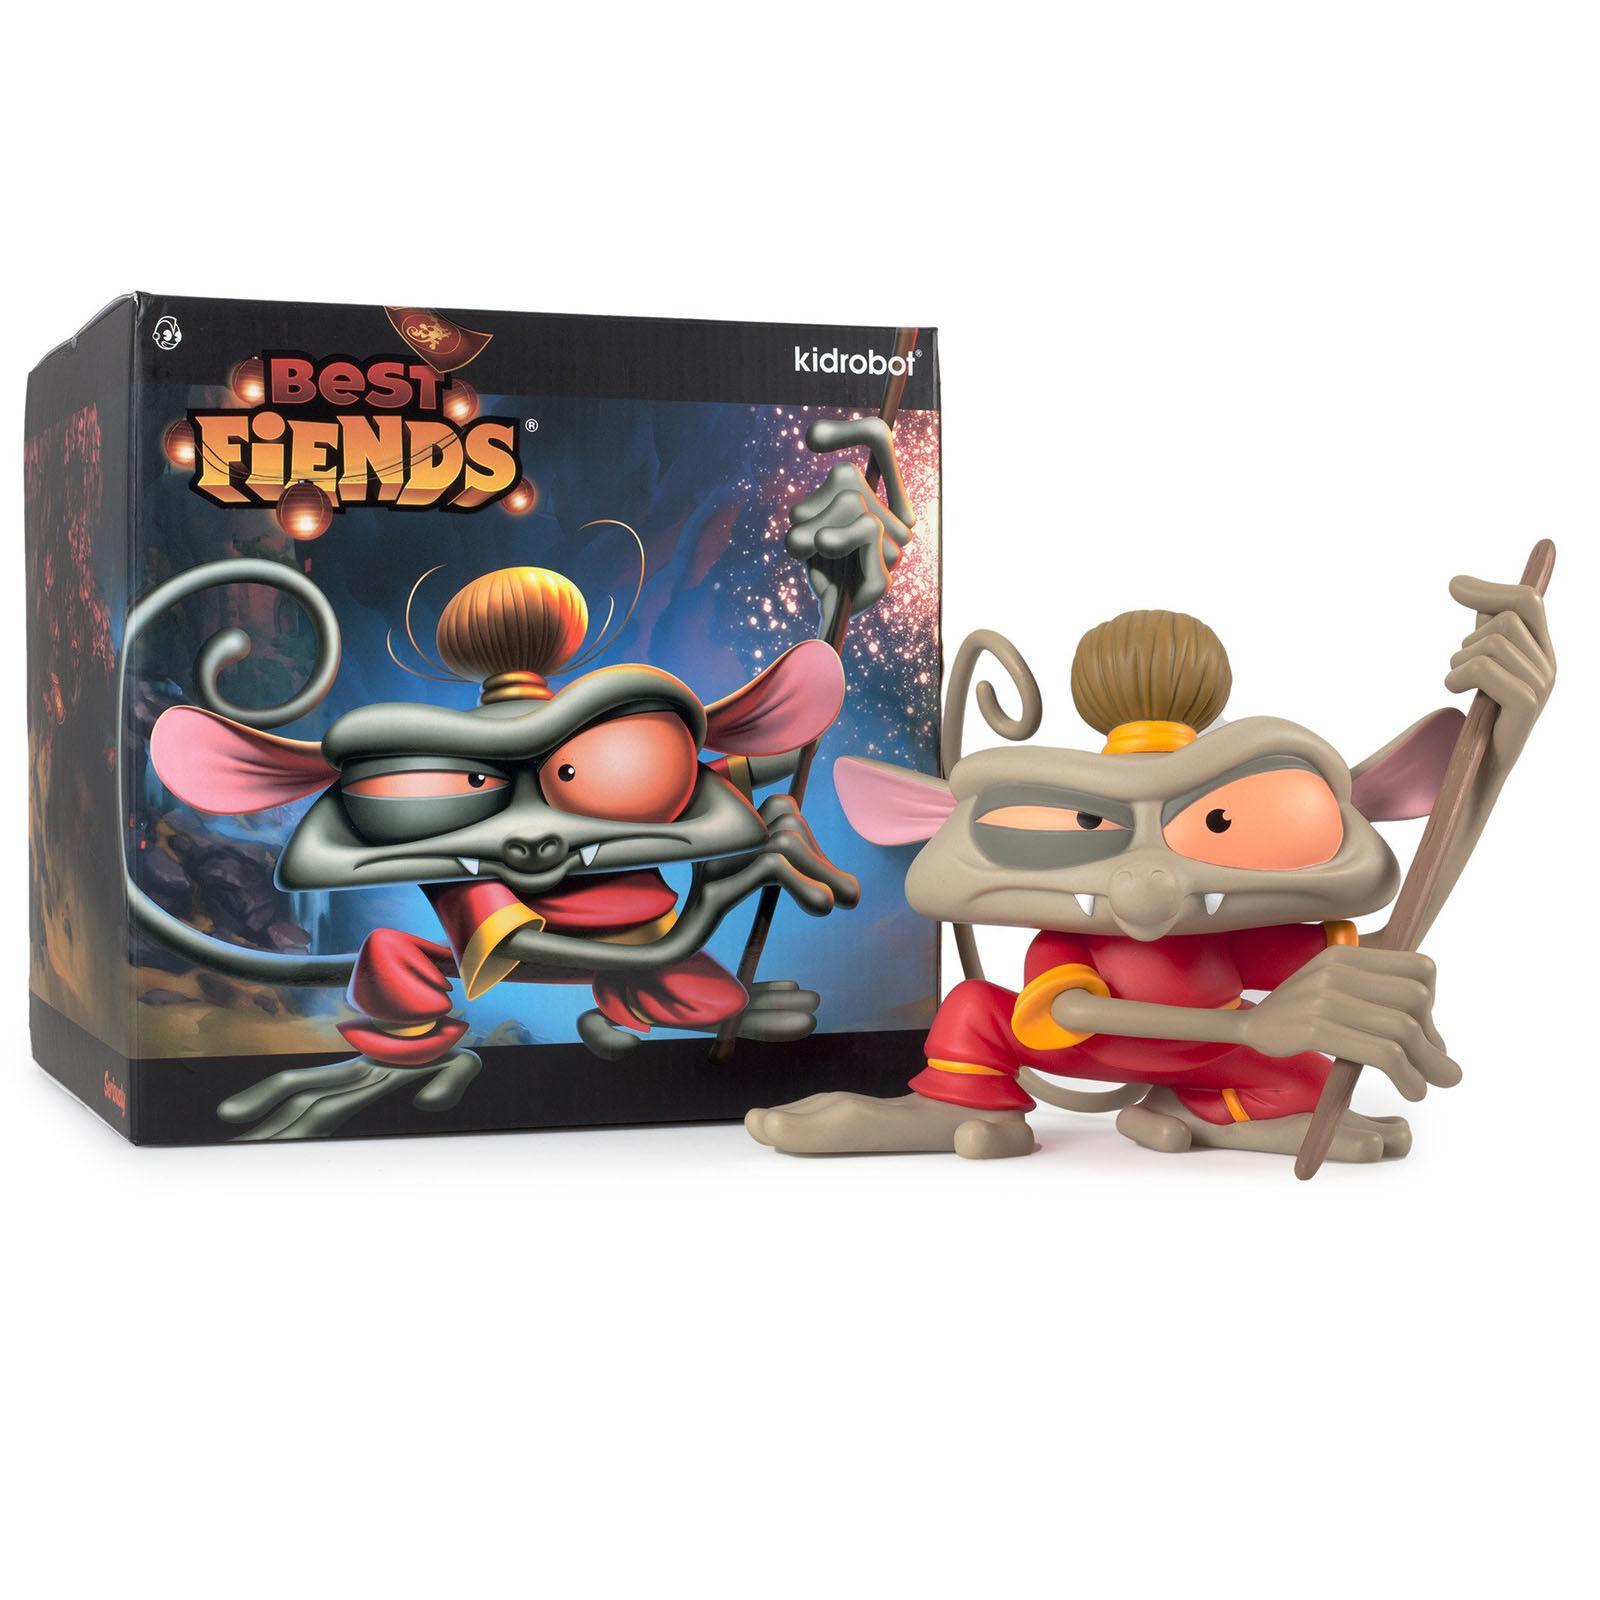 Kidrobot Best Fiends Tarsier Monkey Medium Figure NEW Toys and Collectibles